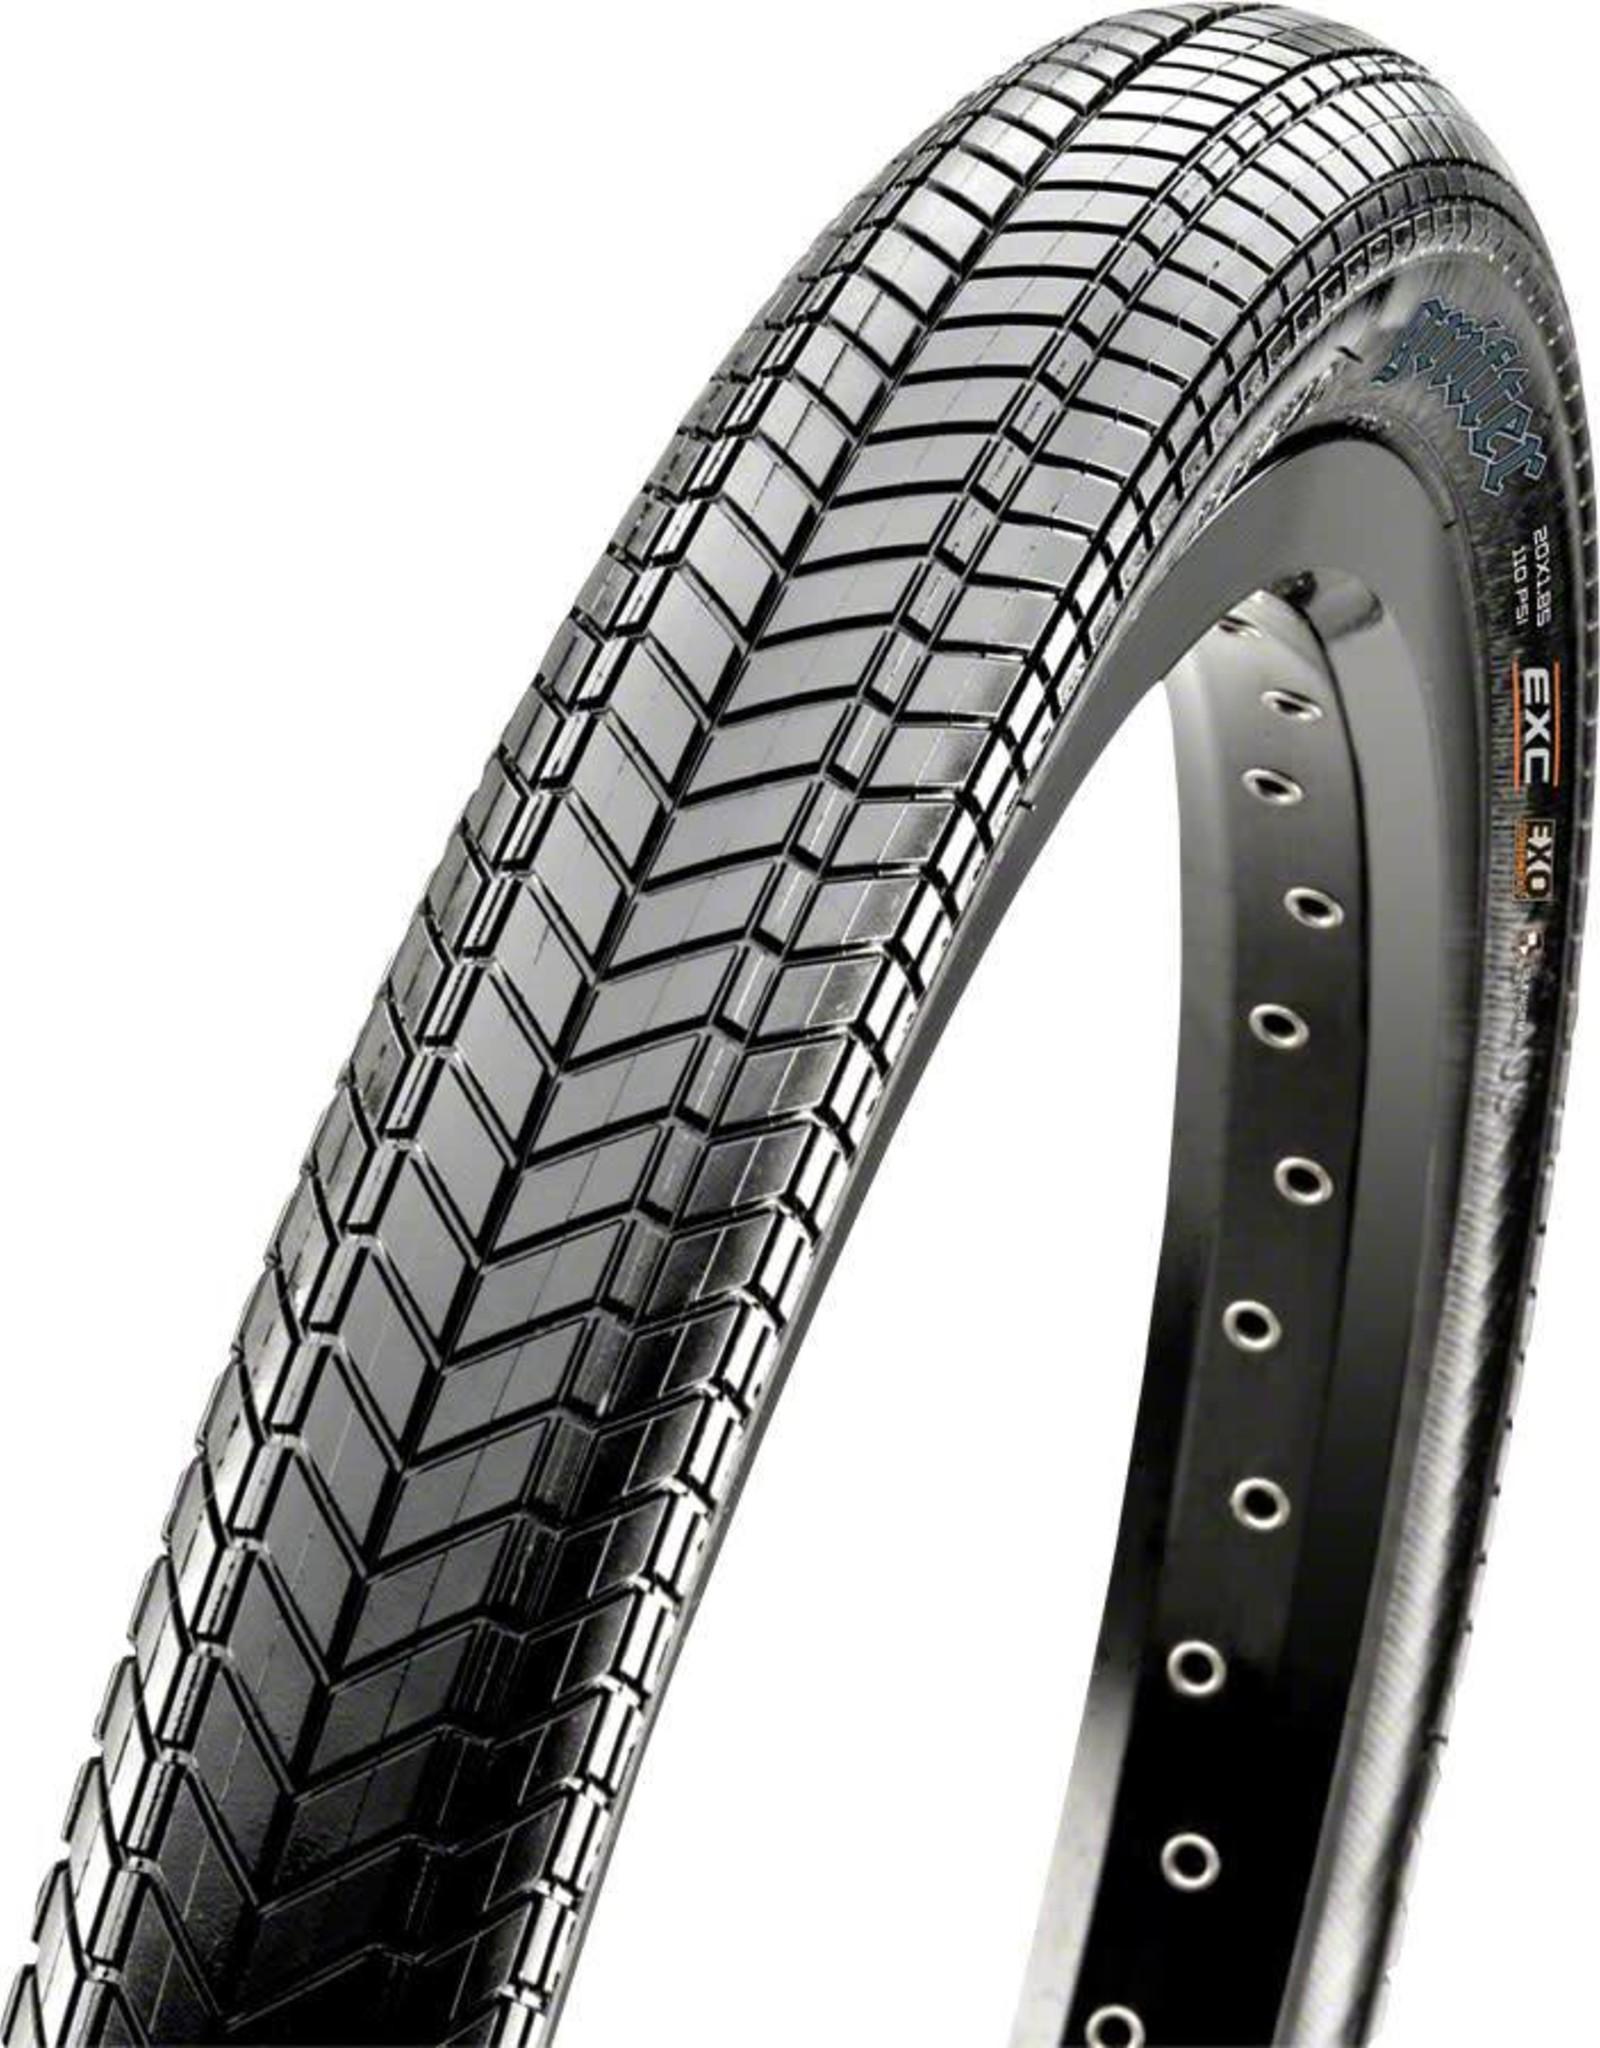 MAXXIS Maxxis Grifter Tire 20x2.4 BLK